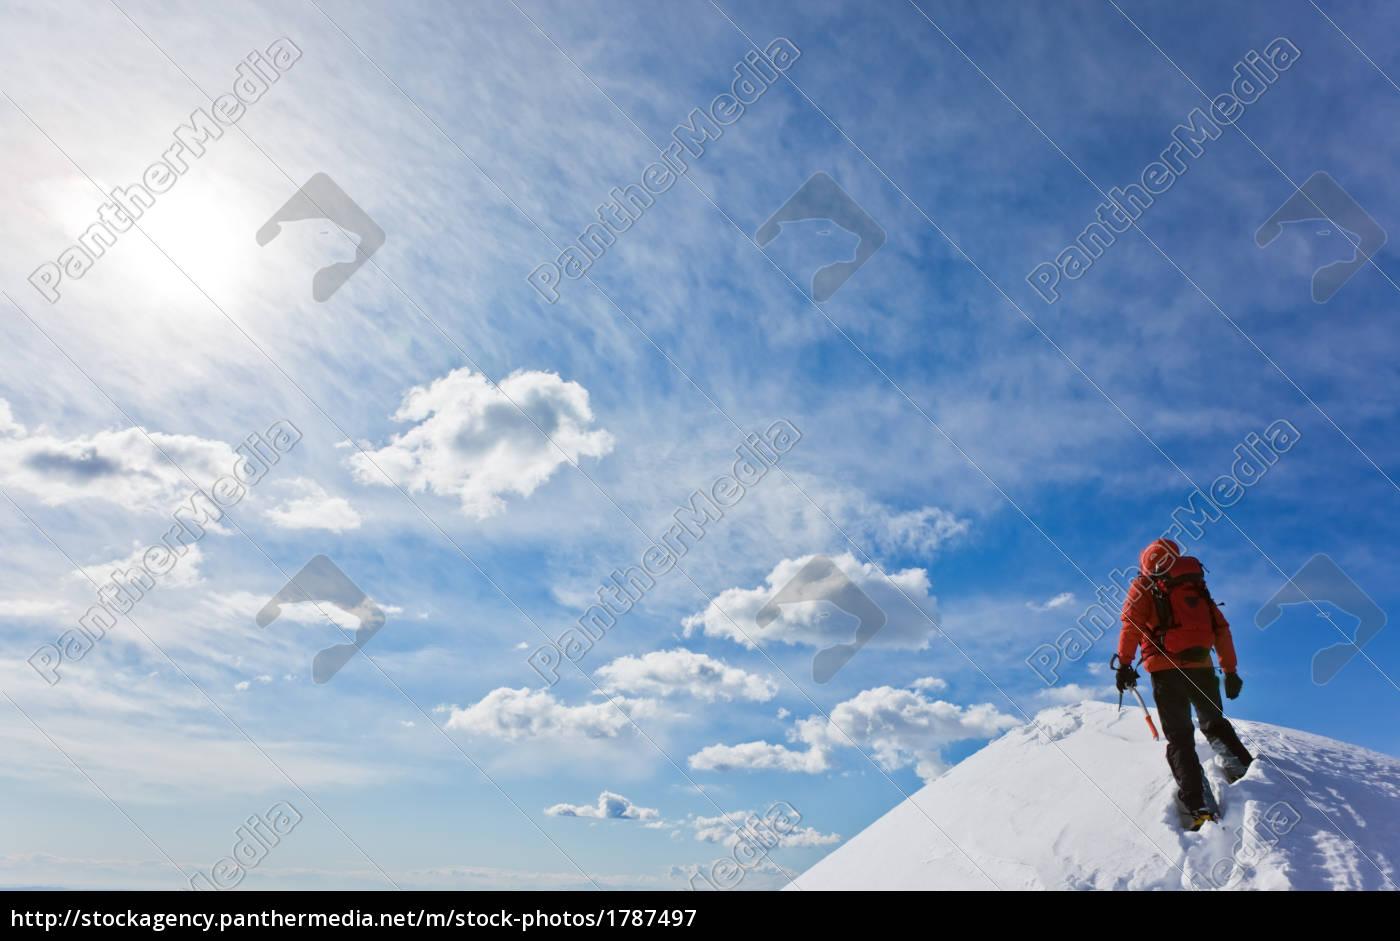 reaching, the, summit - 1787497